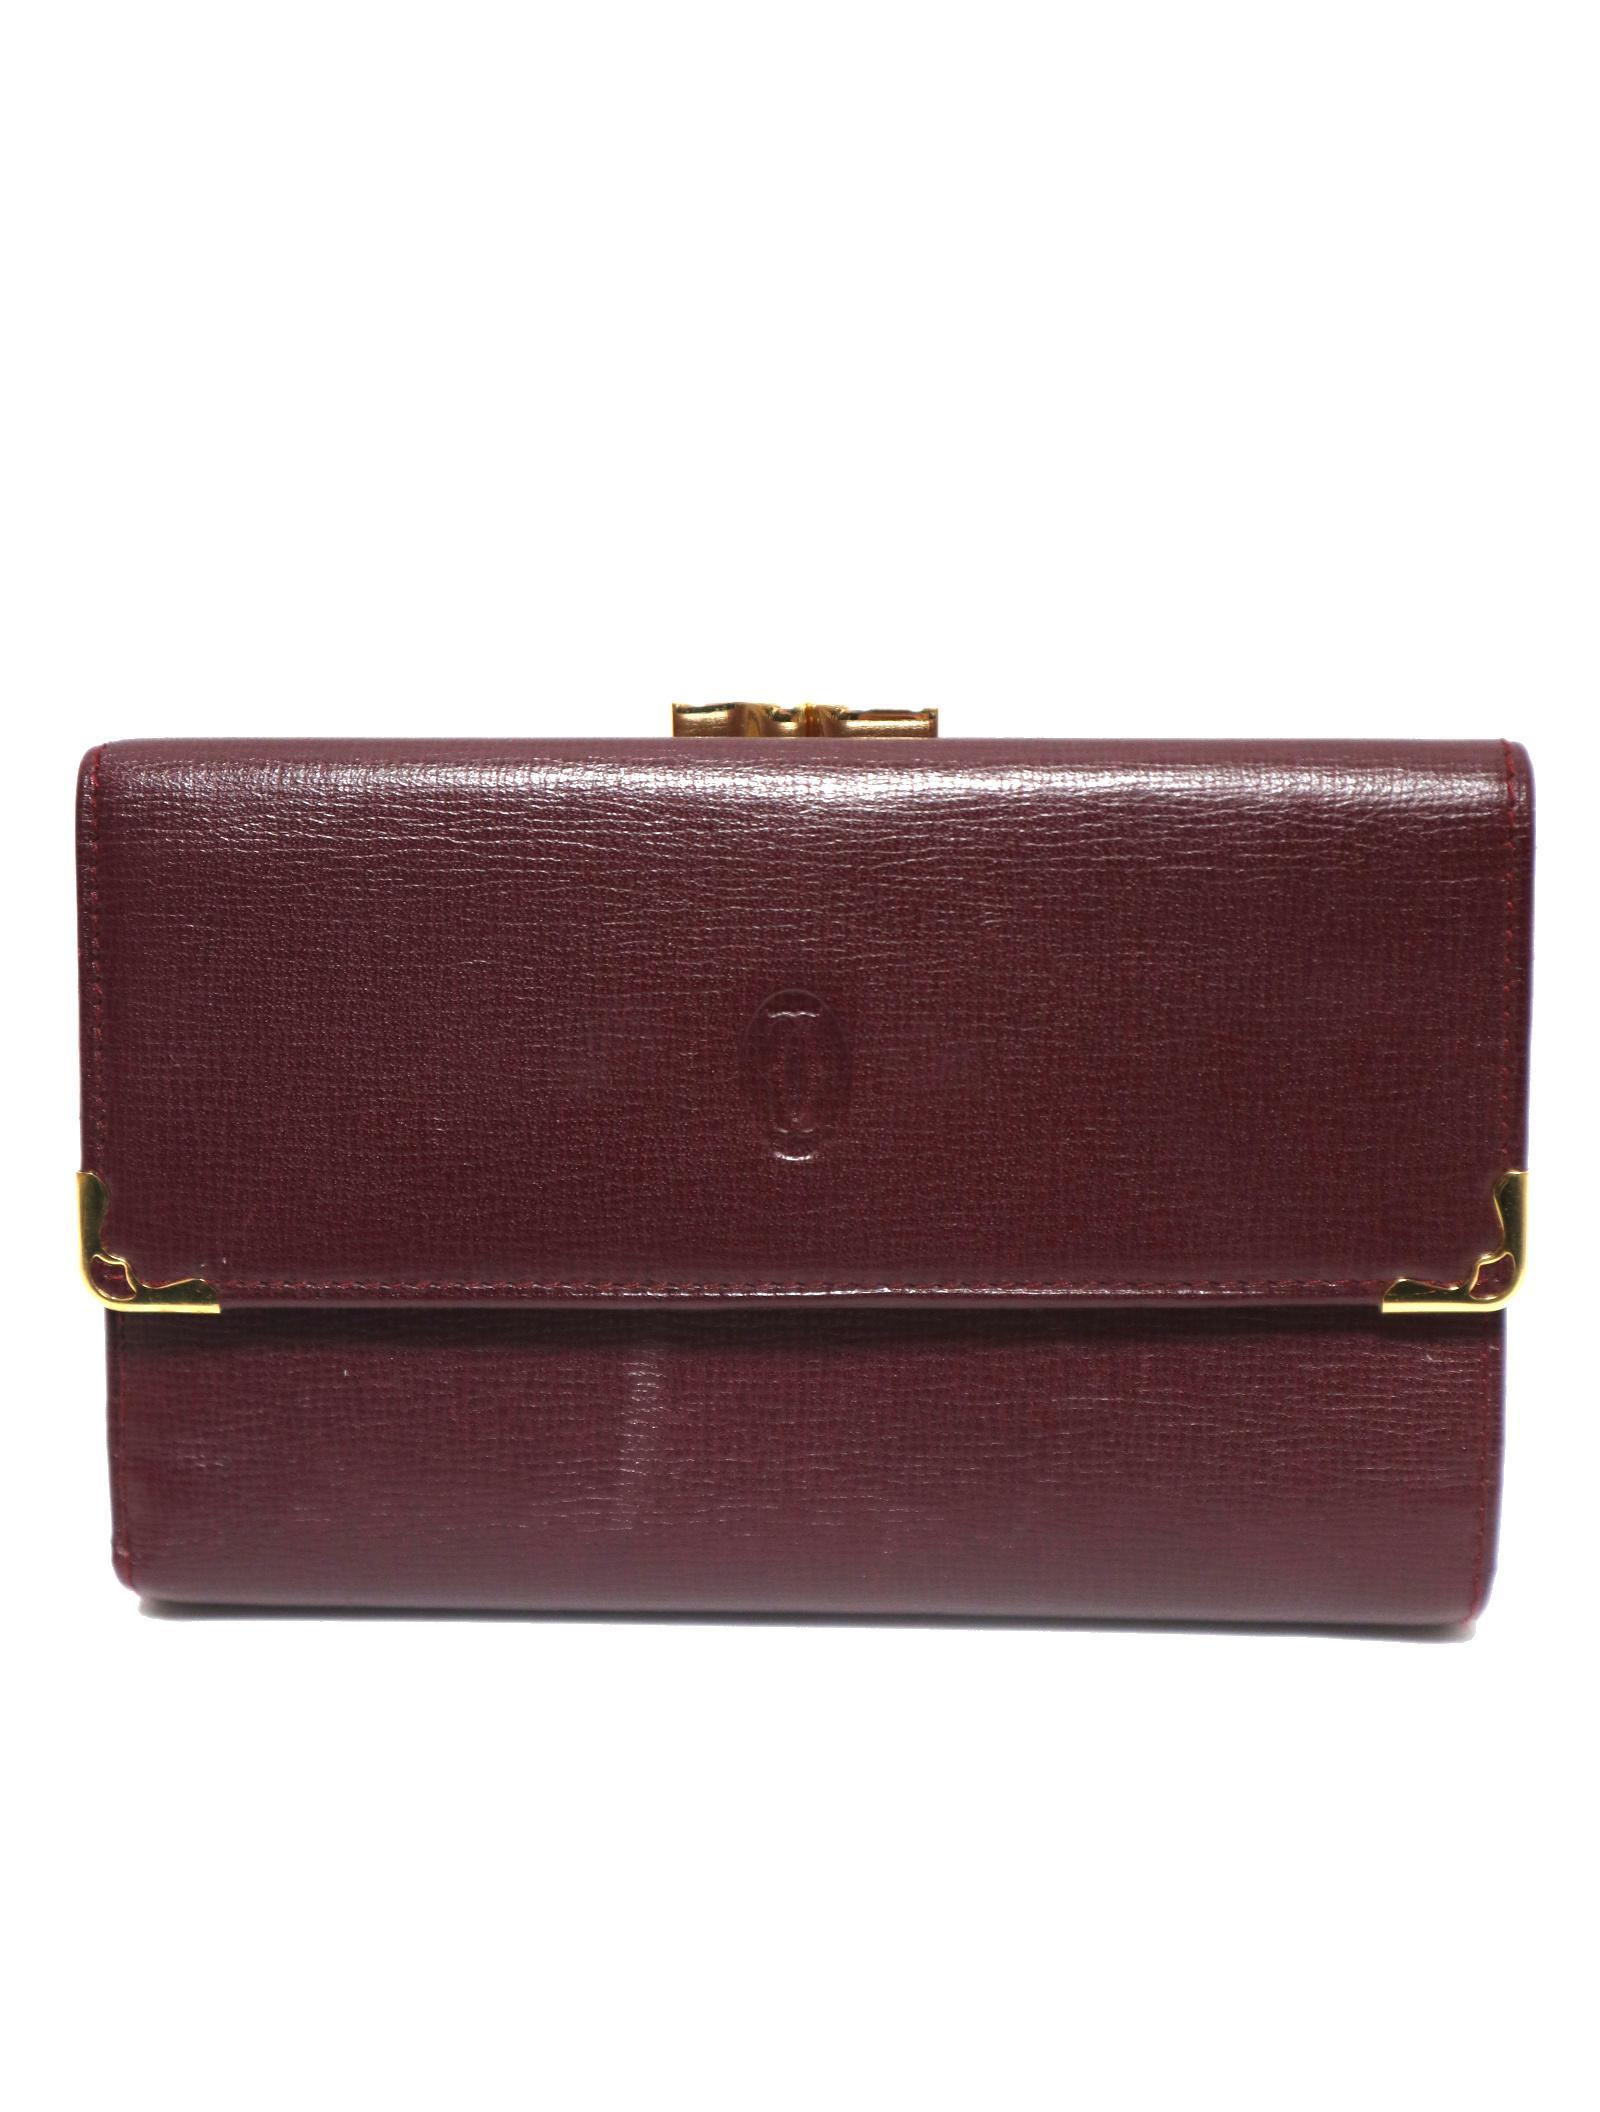 7eae39f57512 中古・古着通販】Cartier (カルティエ) がま口財布 マスト|古着通販 ...